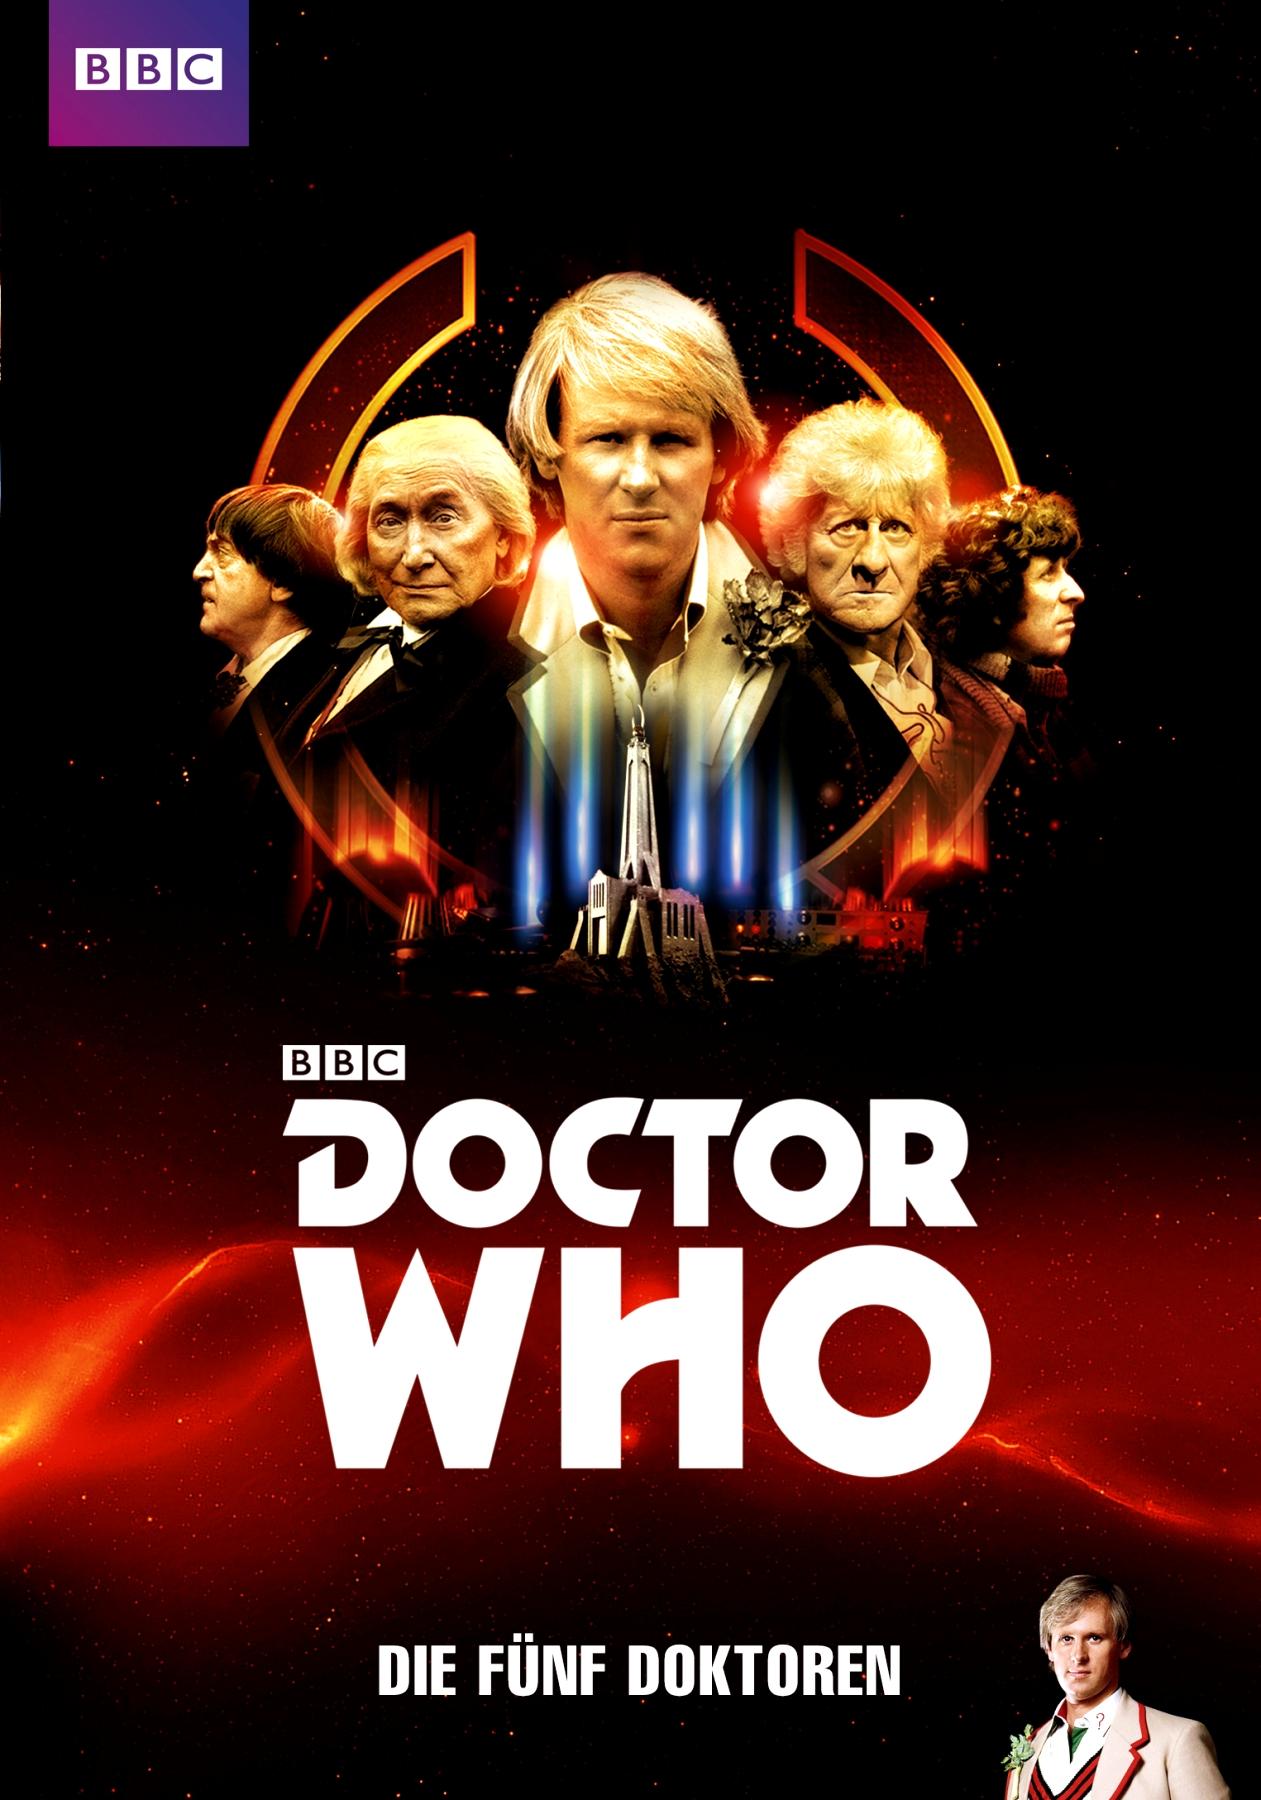 Doctor Who – Die fünf Doktoren (TV-Serie, DVD)